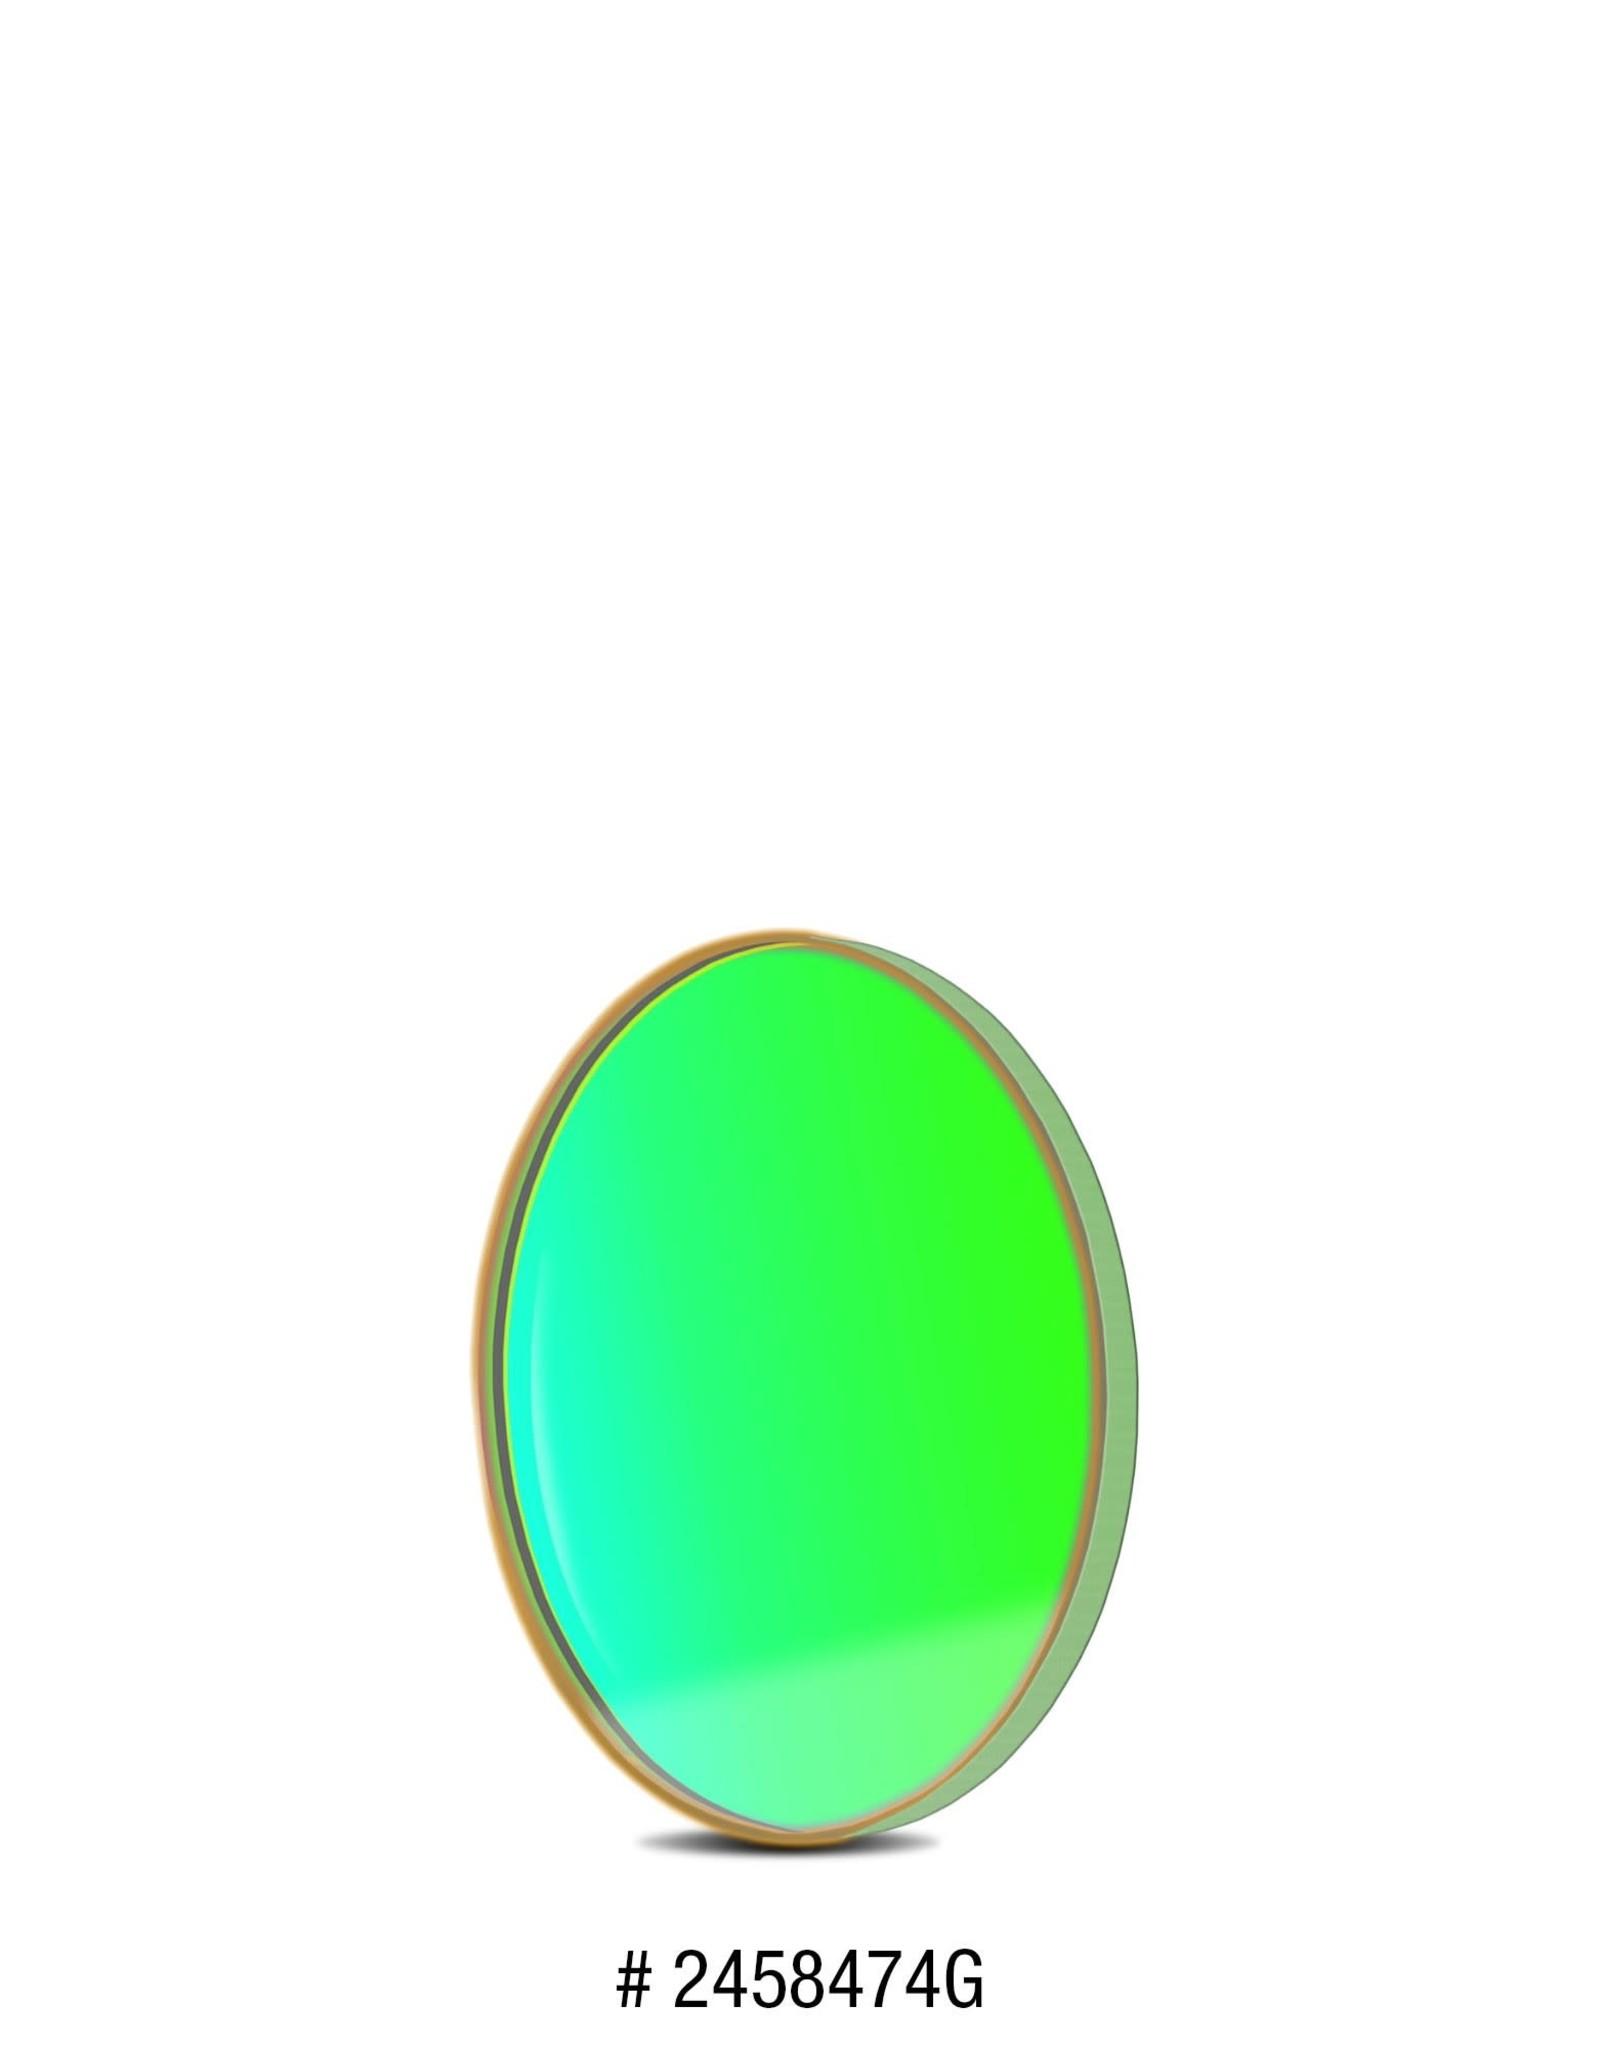 Baader Planetarium Baader G-CCD Filter (Green) (Specify Size)